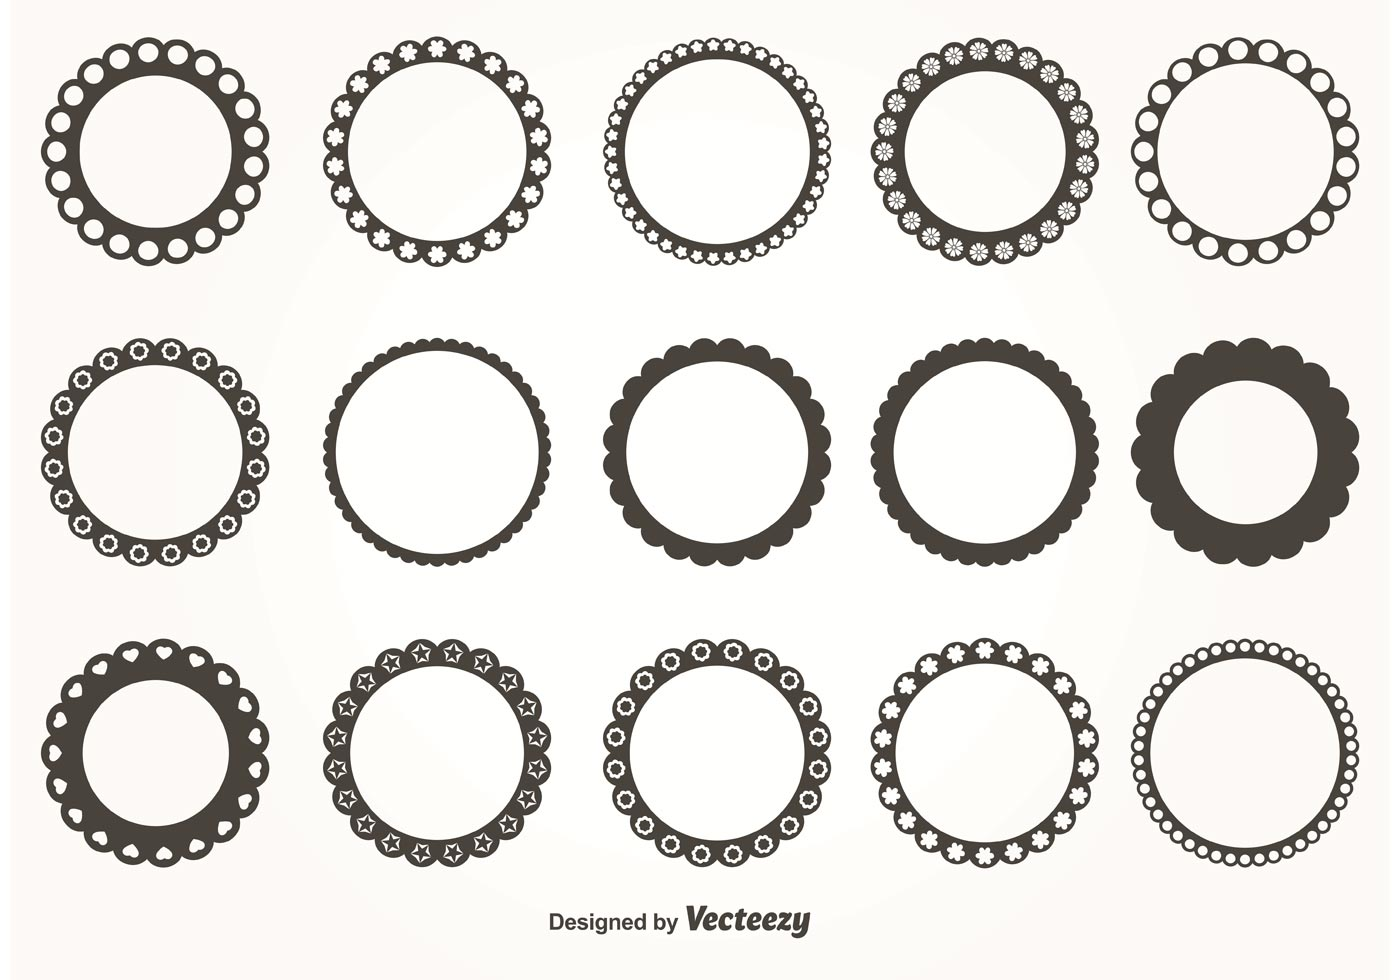 Runde Scalloped Vektor Rahmen - Kostenlose Vektor-Kunst, Archiv ...